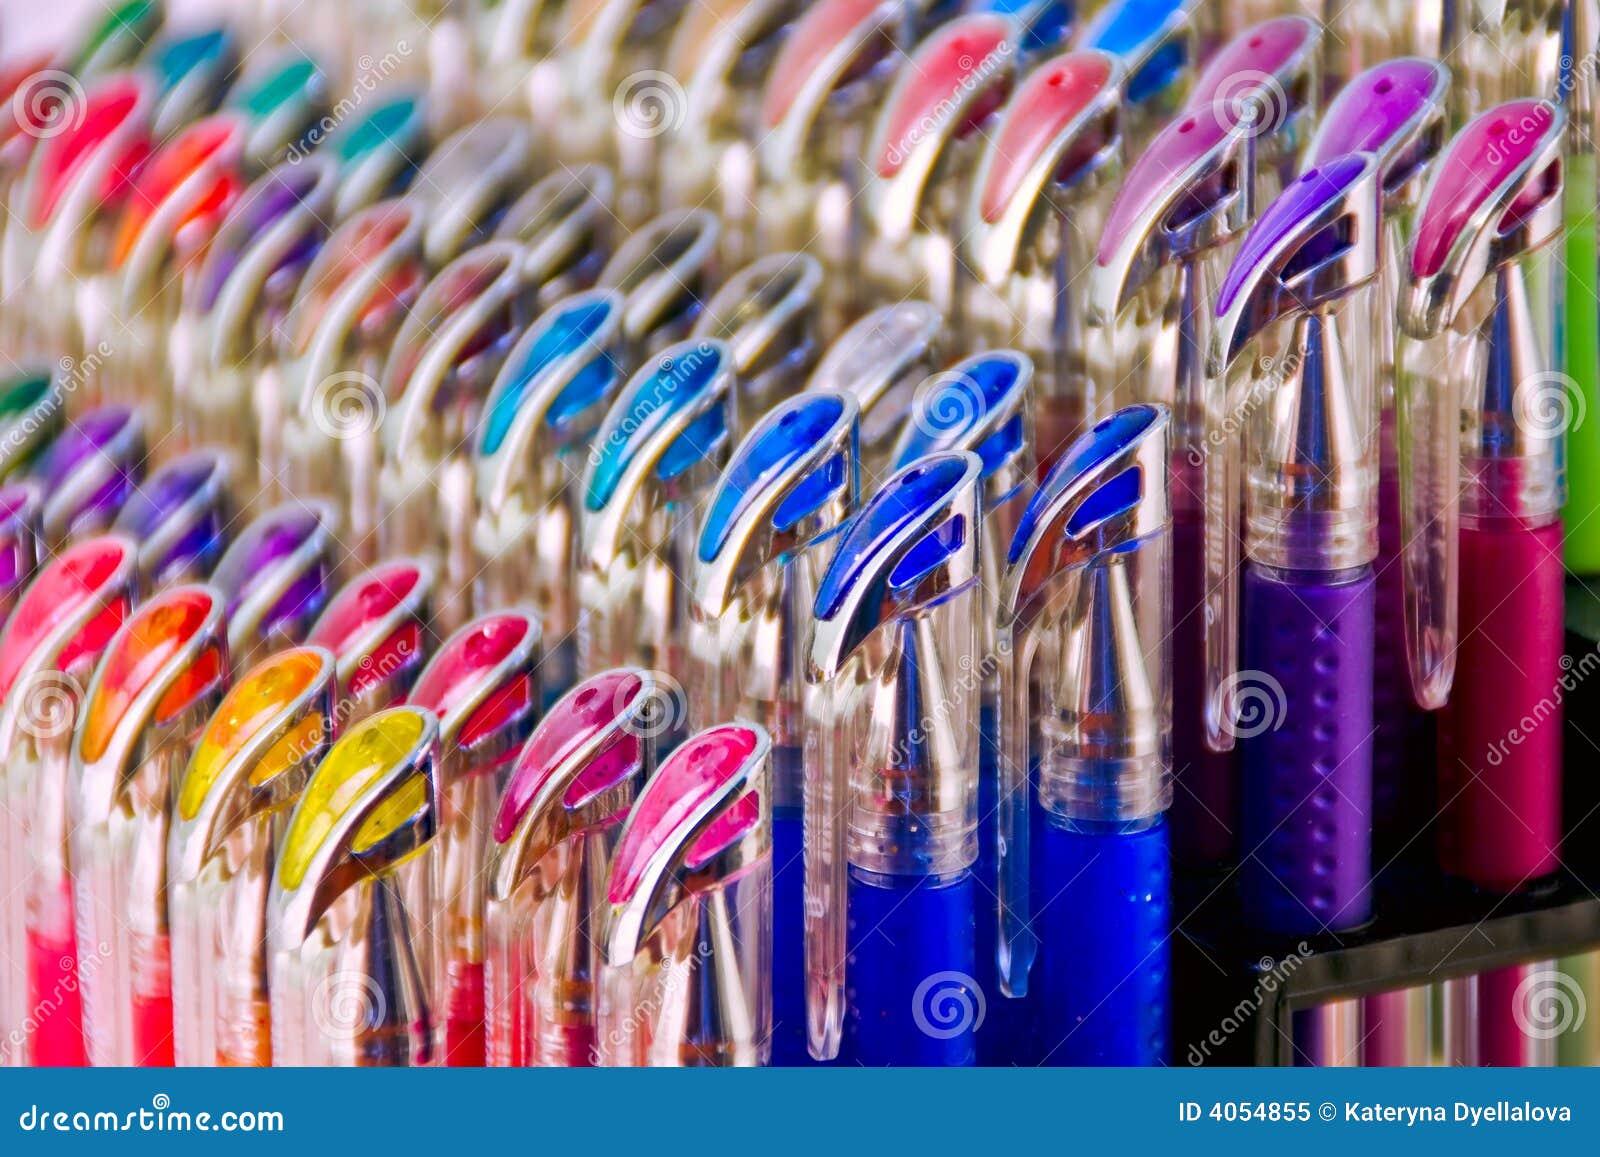 Colourful Gel Pens